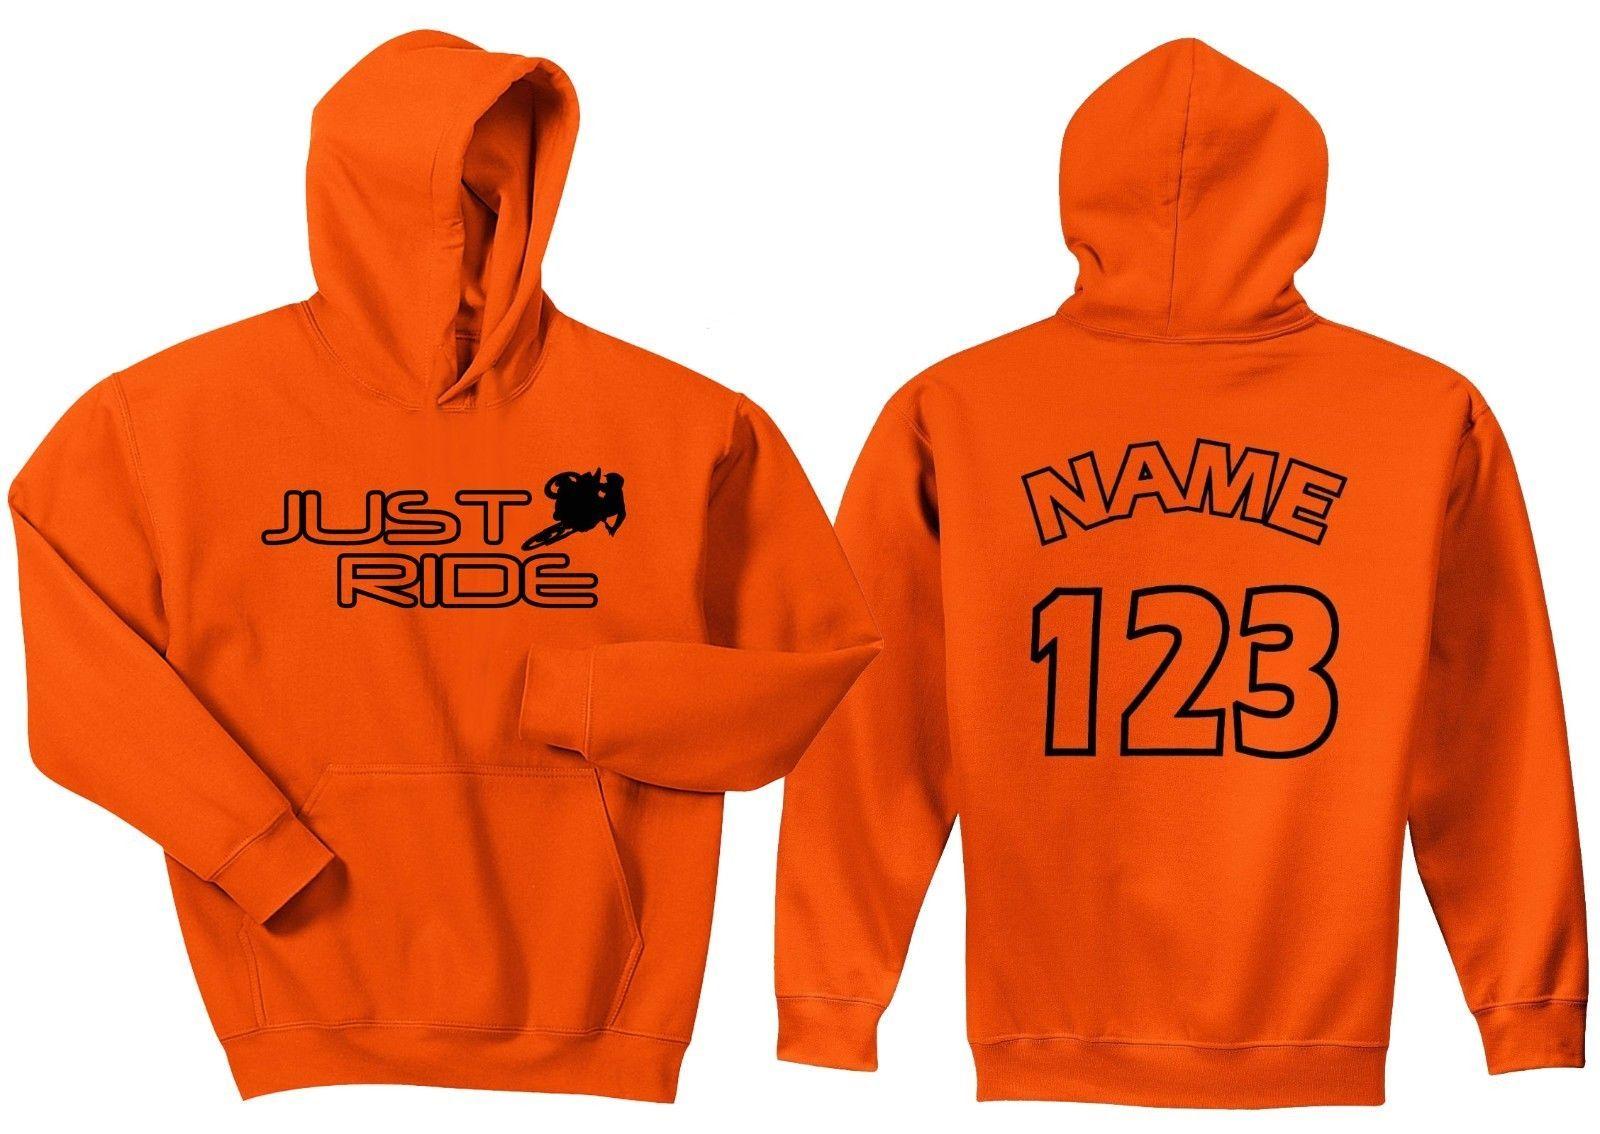 Just Ride Motocross Orange Hoodie Sweat Shirt Mx Race Dirt Bike Number Plate Ktm Ebay Sweatshirts Hoodies Sweatshirts Hoodie